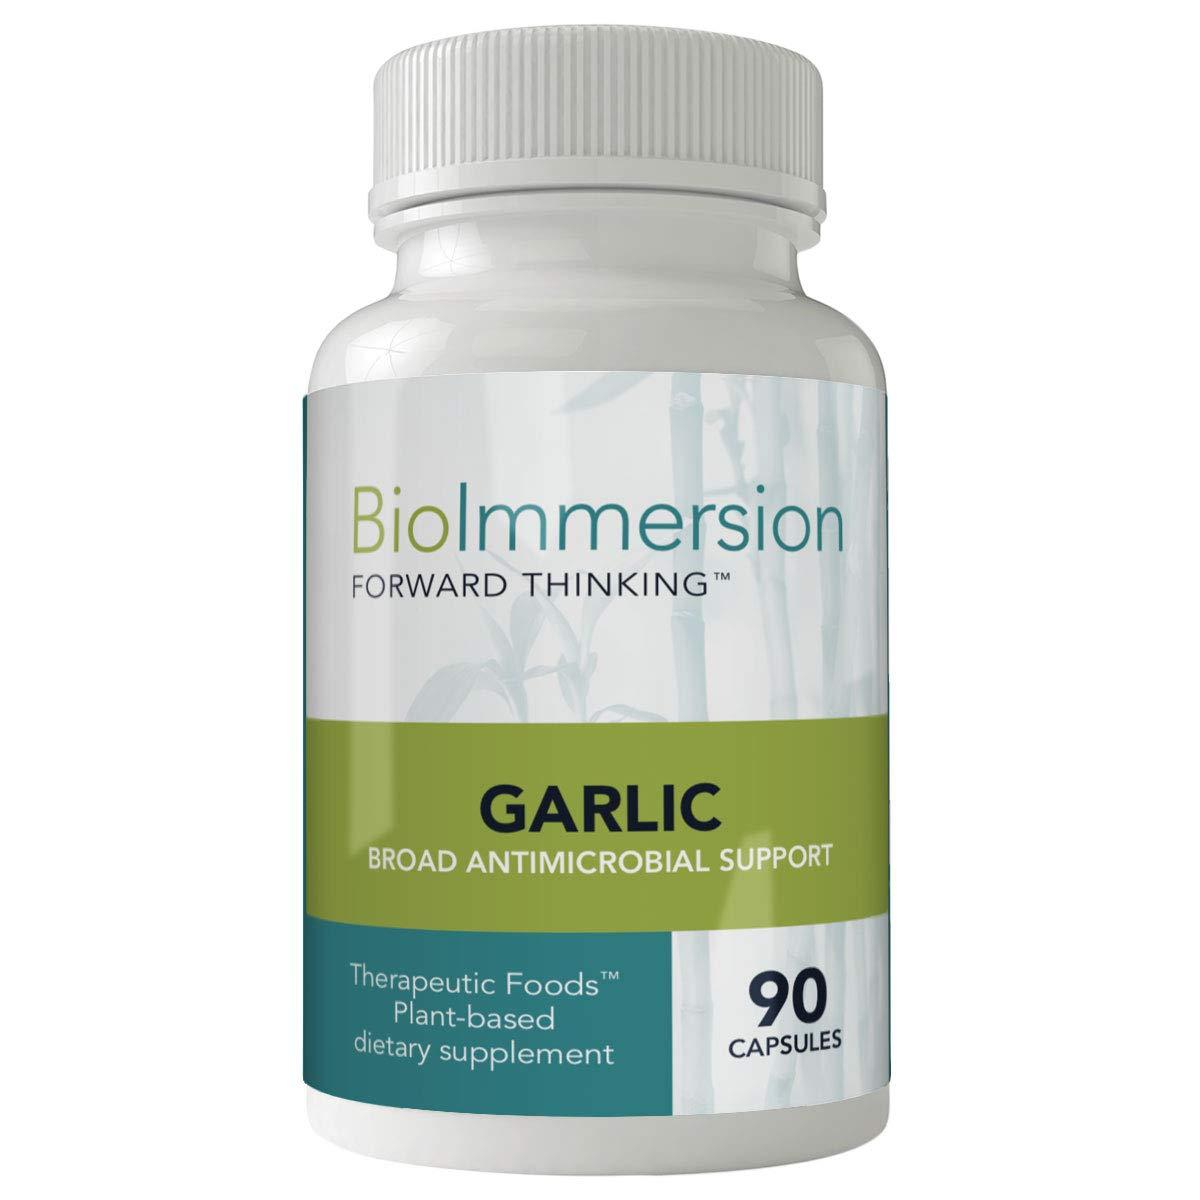 BioImmersion - Garlic, Organic - Natural broad-spectrum antimicrobial support - 90 capsules